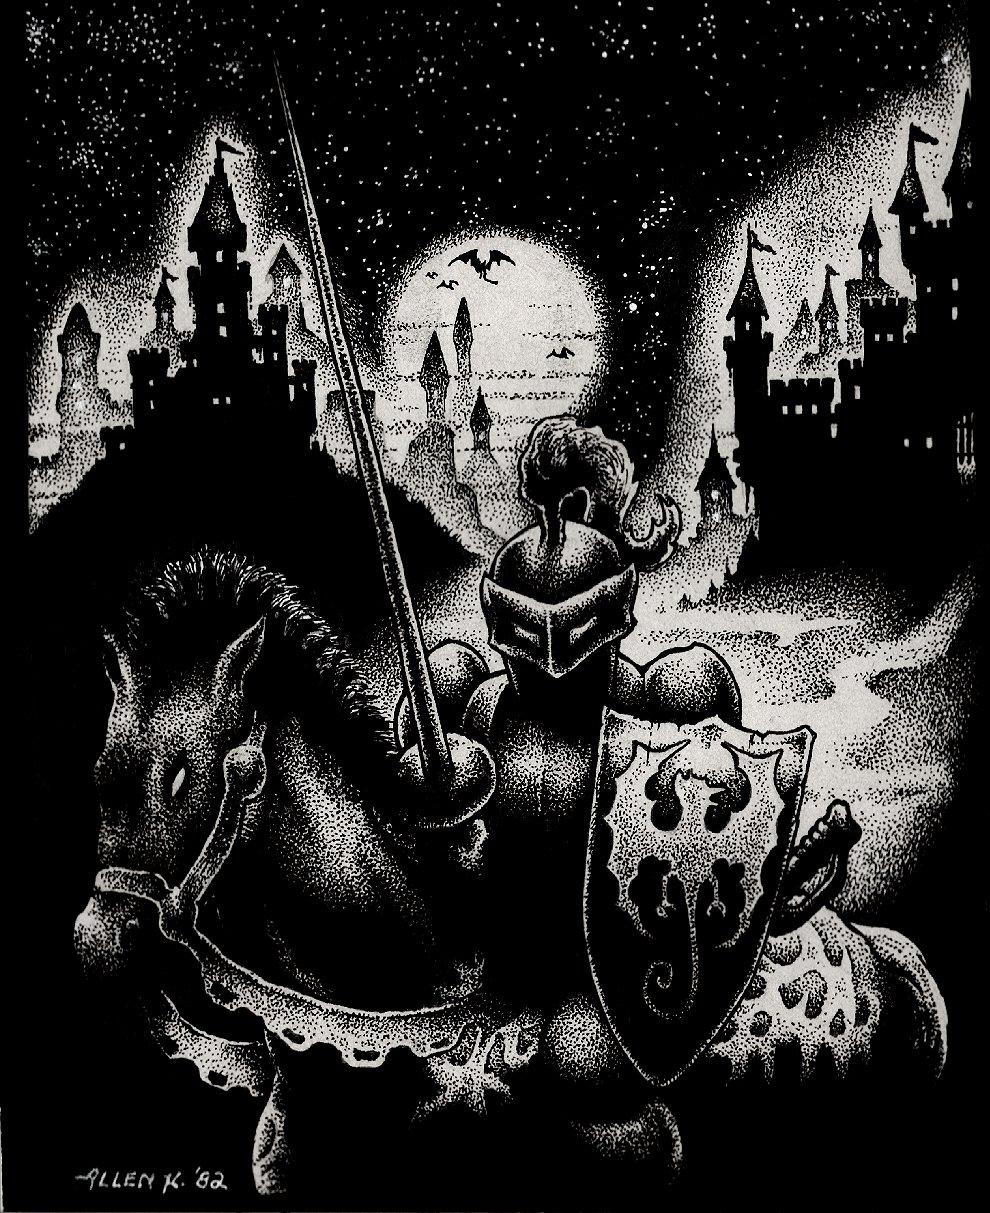 Knight On Horseback With Castle Background Published Fanzine Pinup (1982)